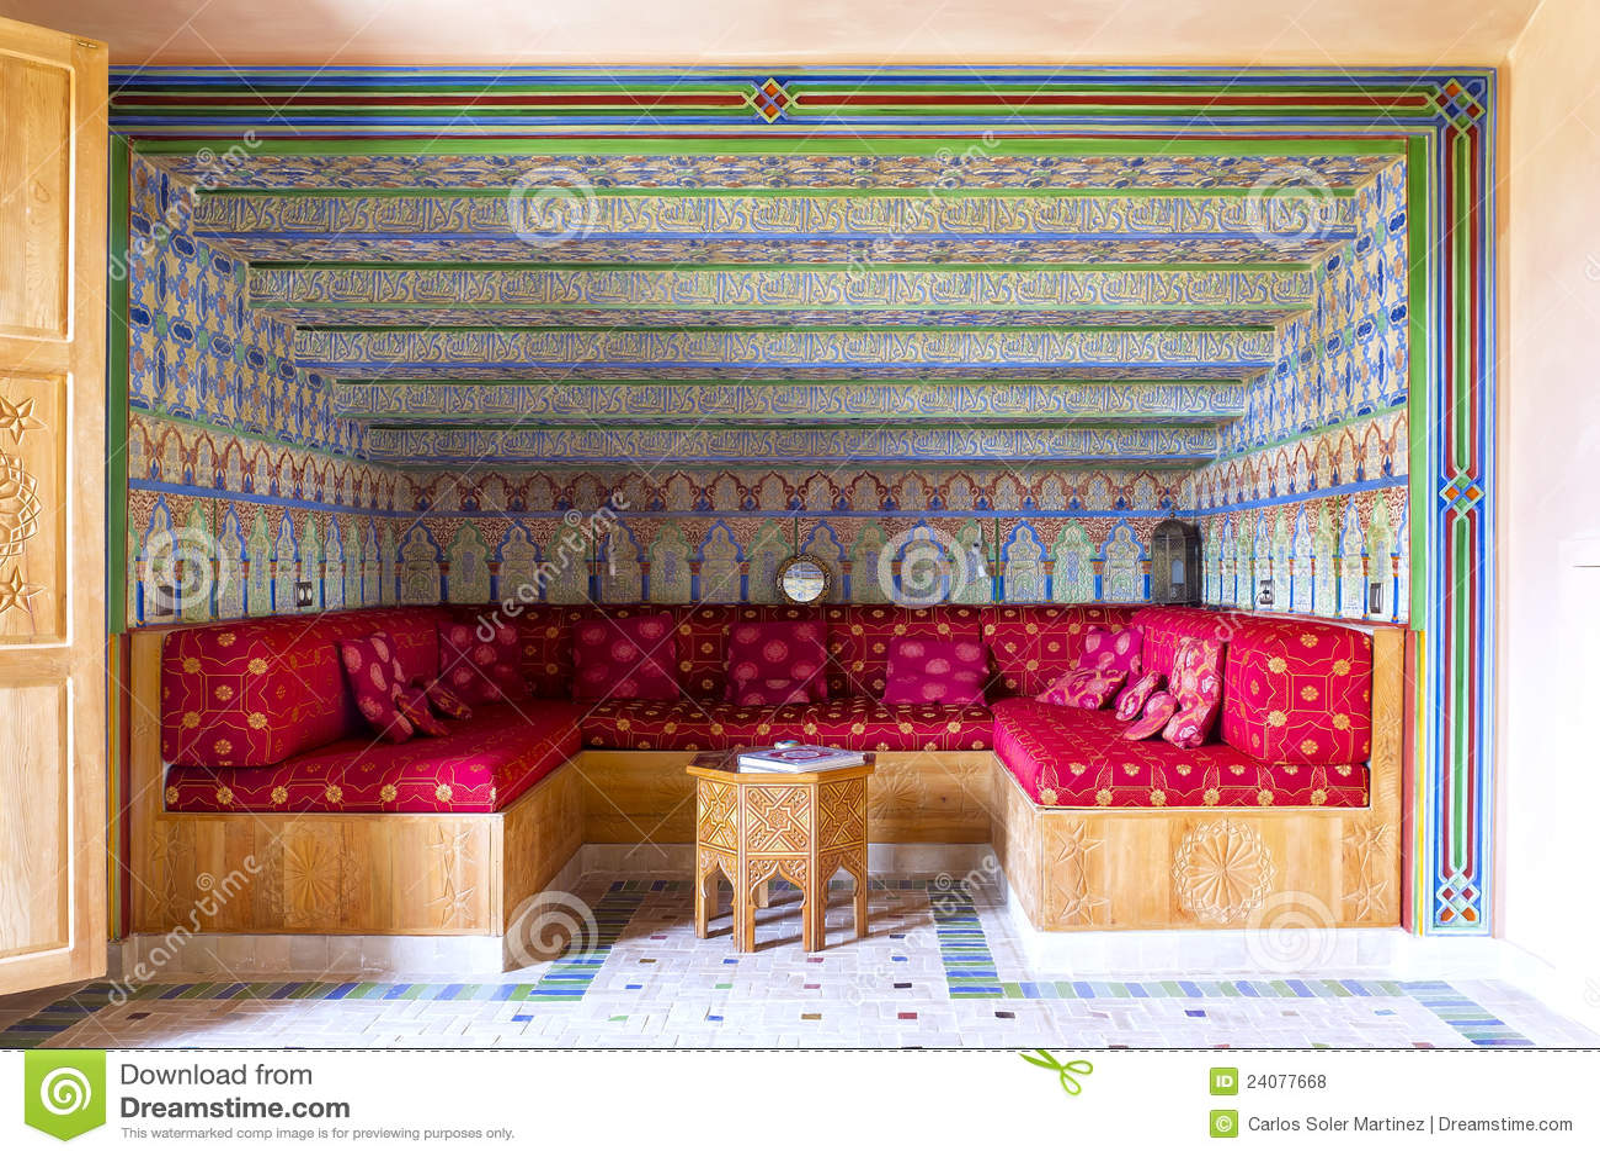 Decoration Of Salon Arabic Style Royalty Free Stock Photos Image 24077668